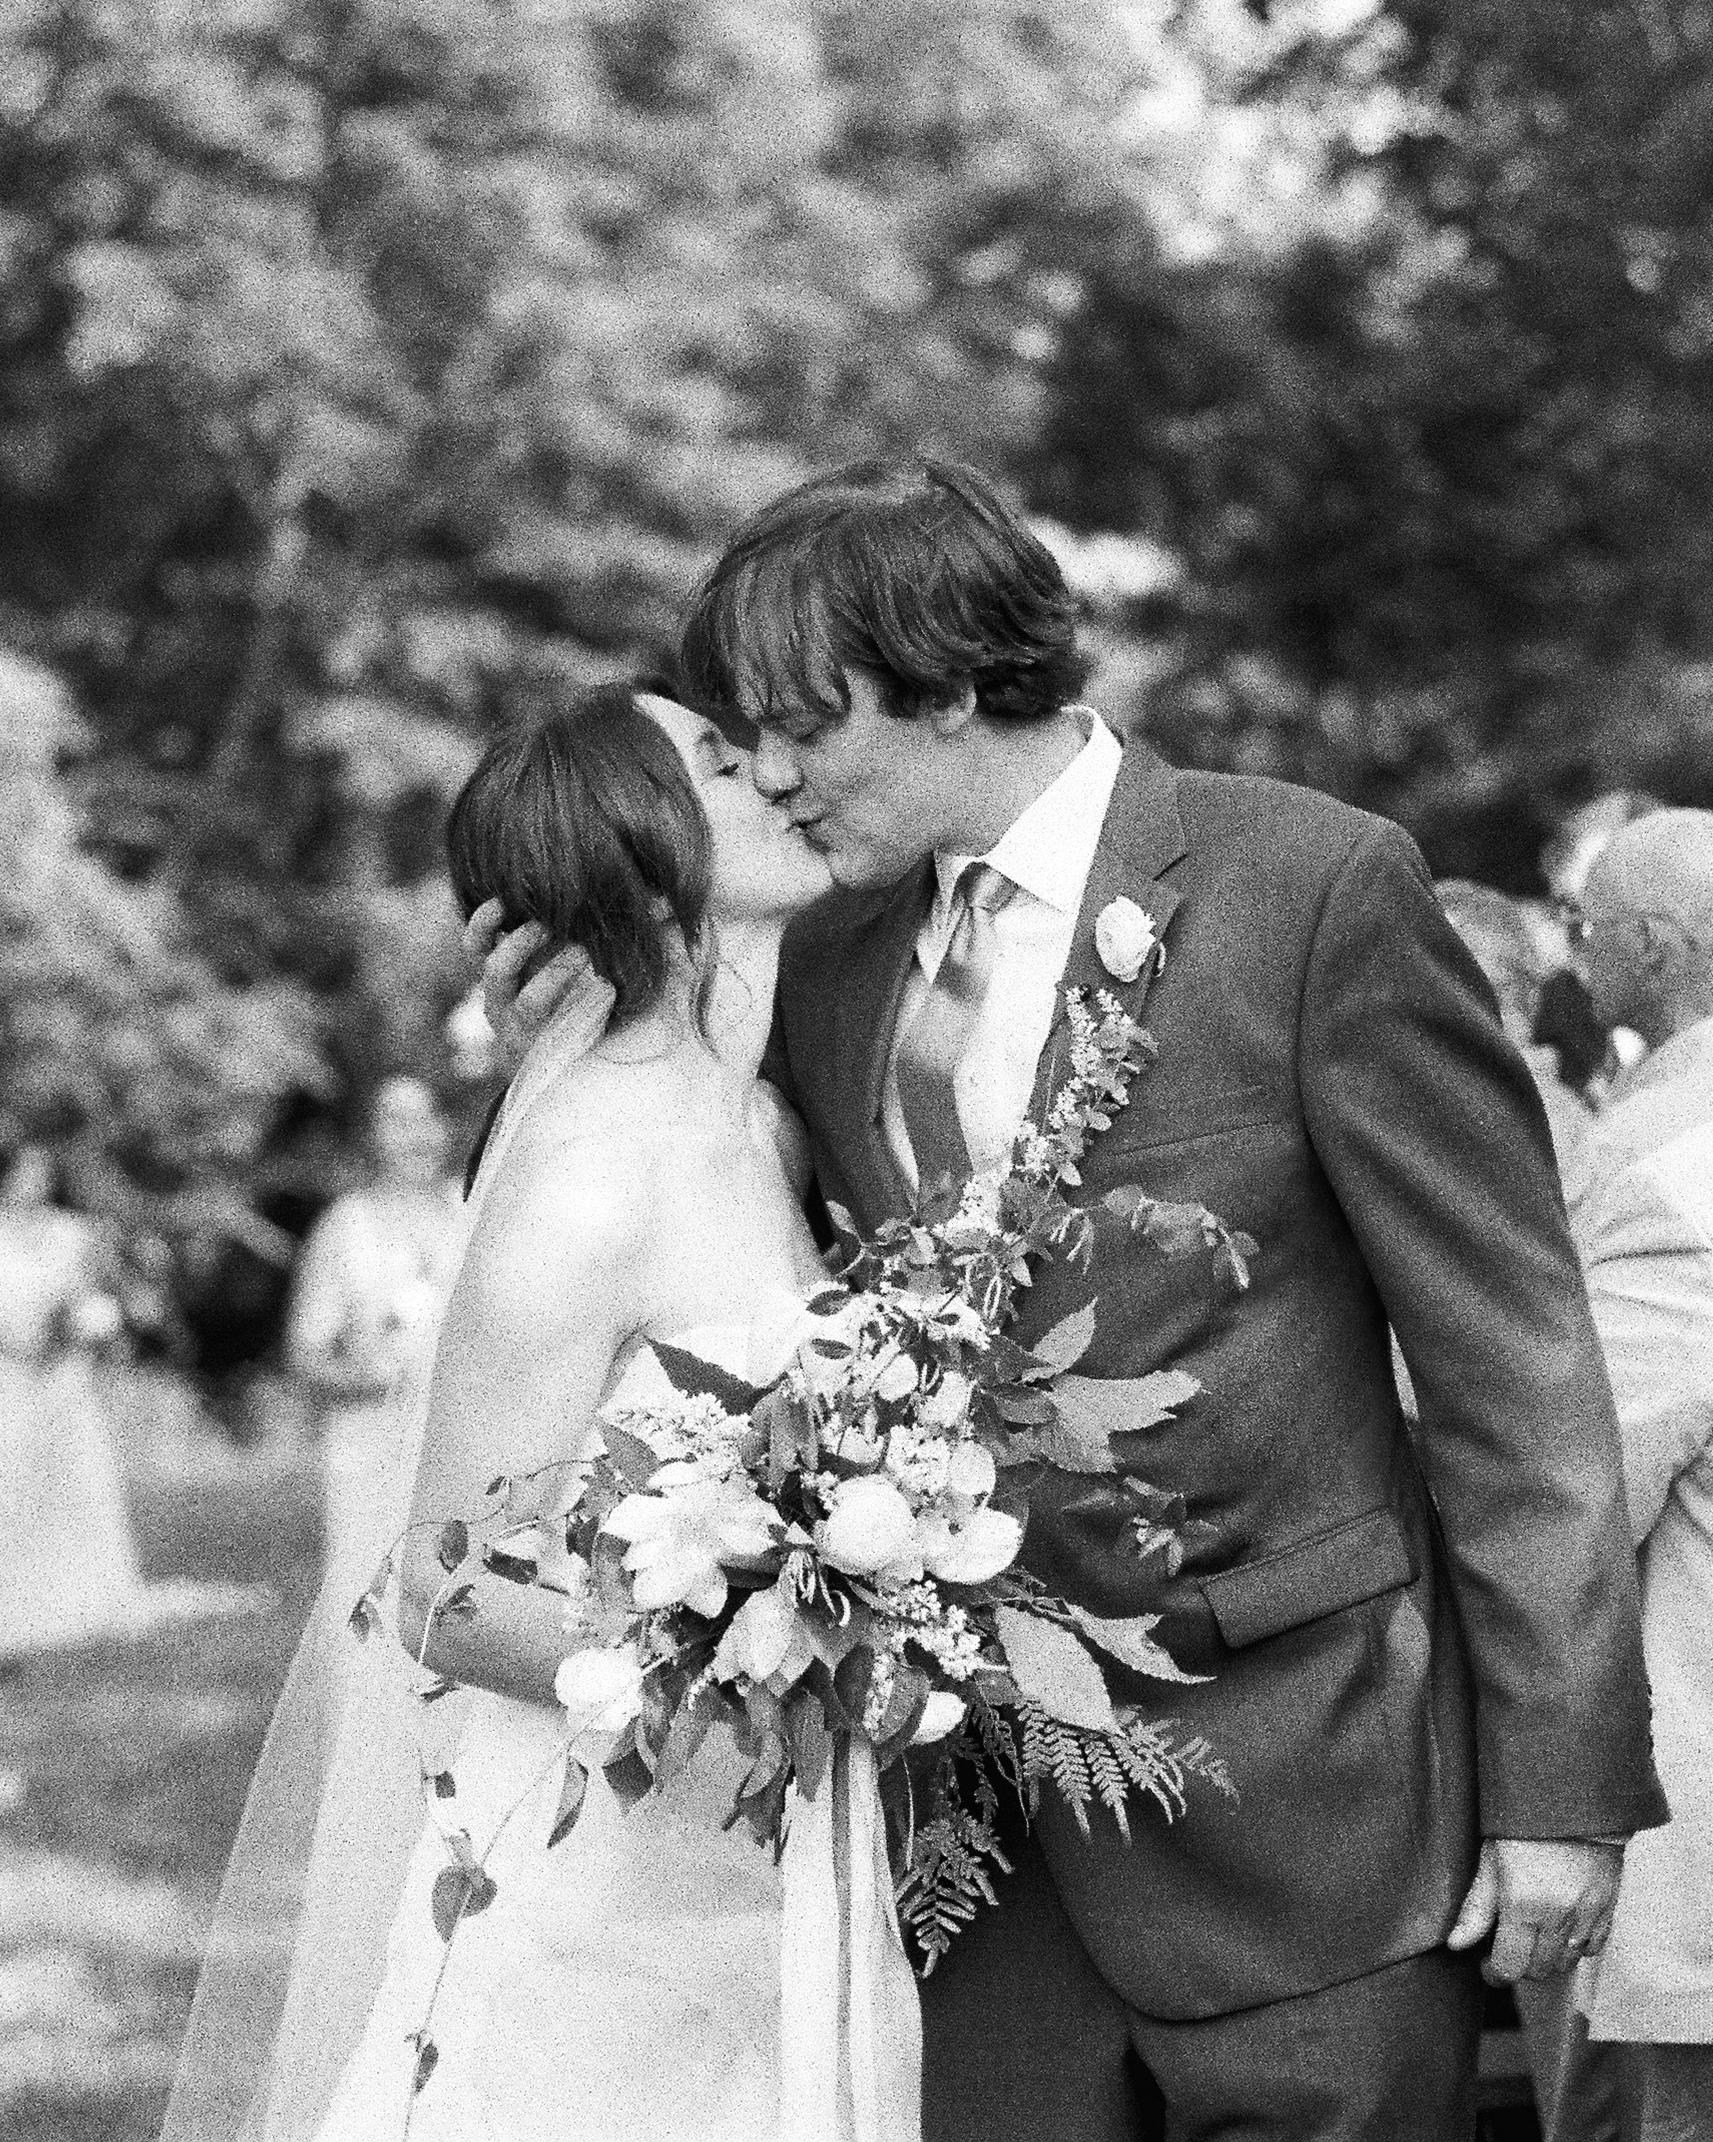 saron-neal-wedding-mississippi-00279-s111701.jpg